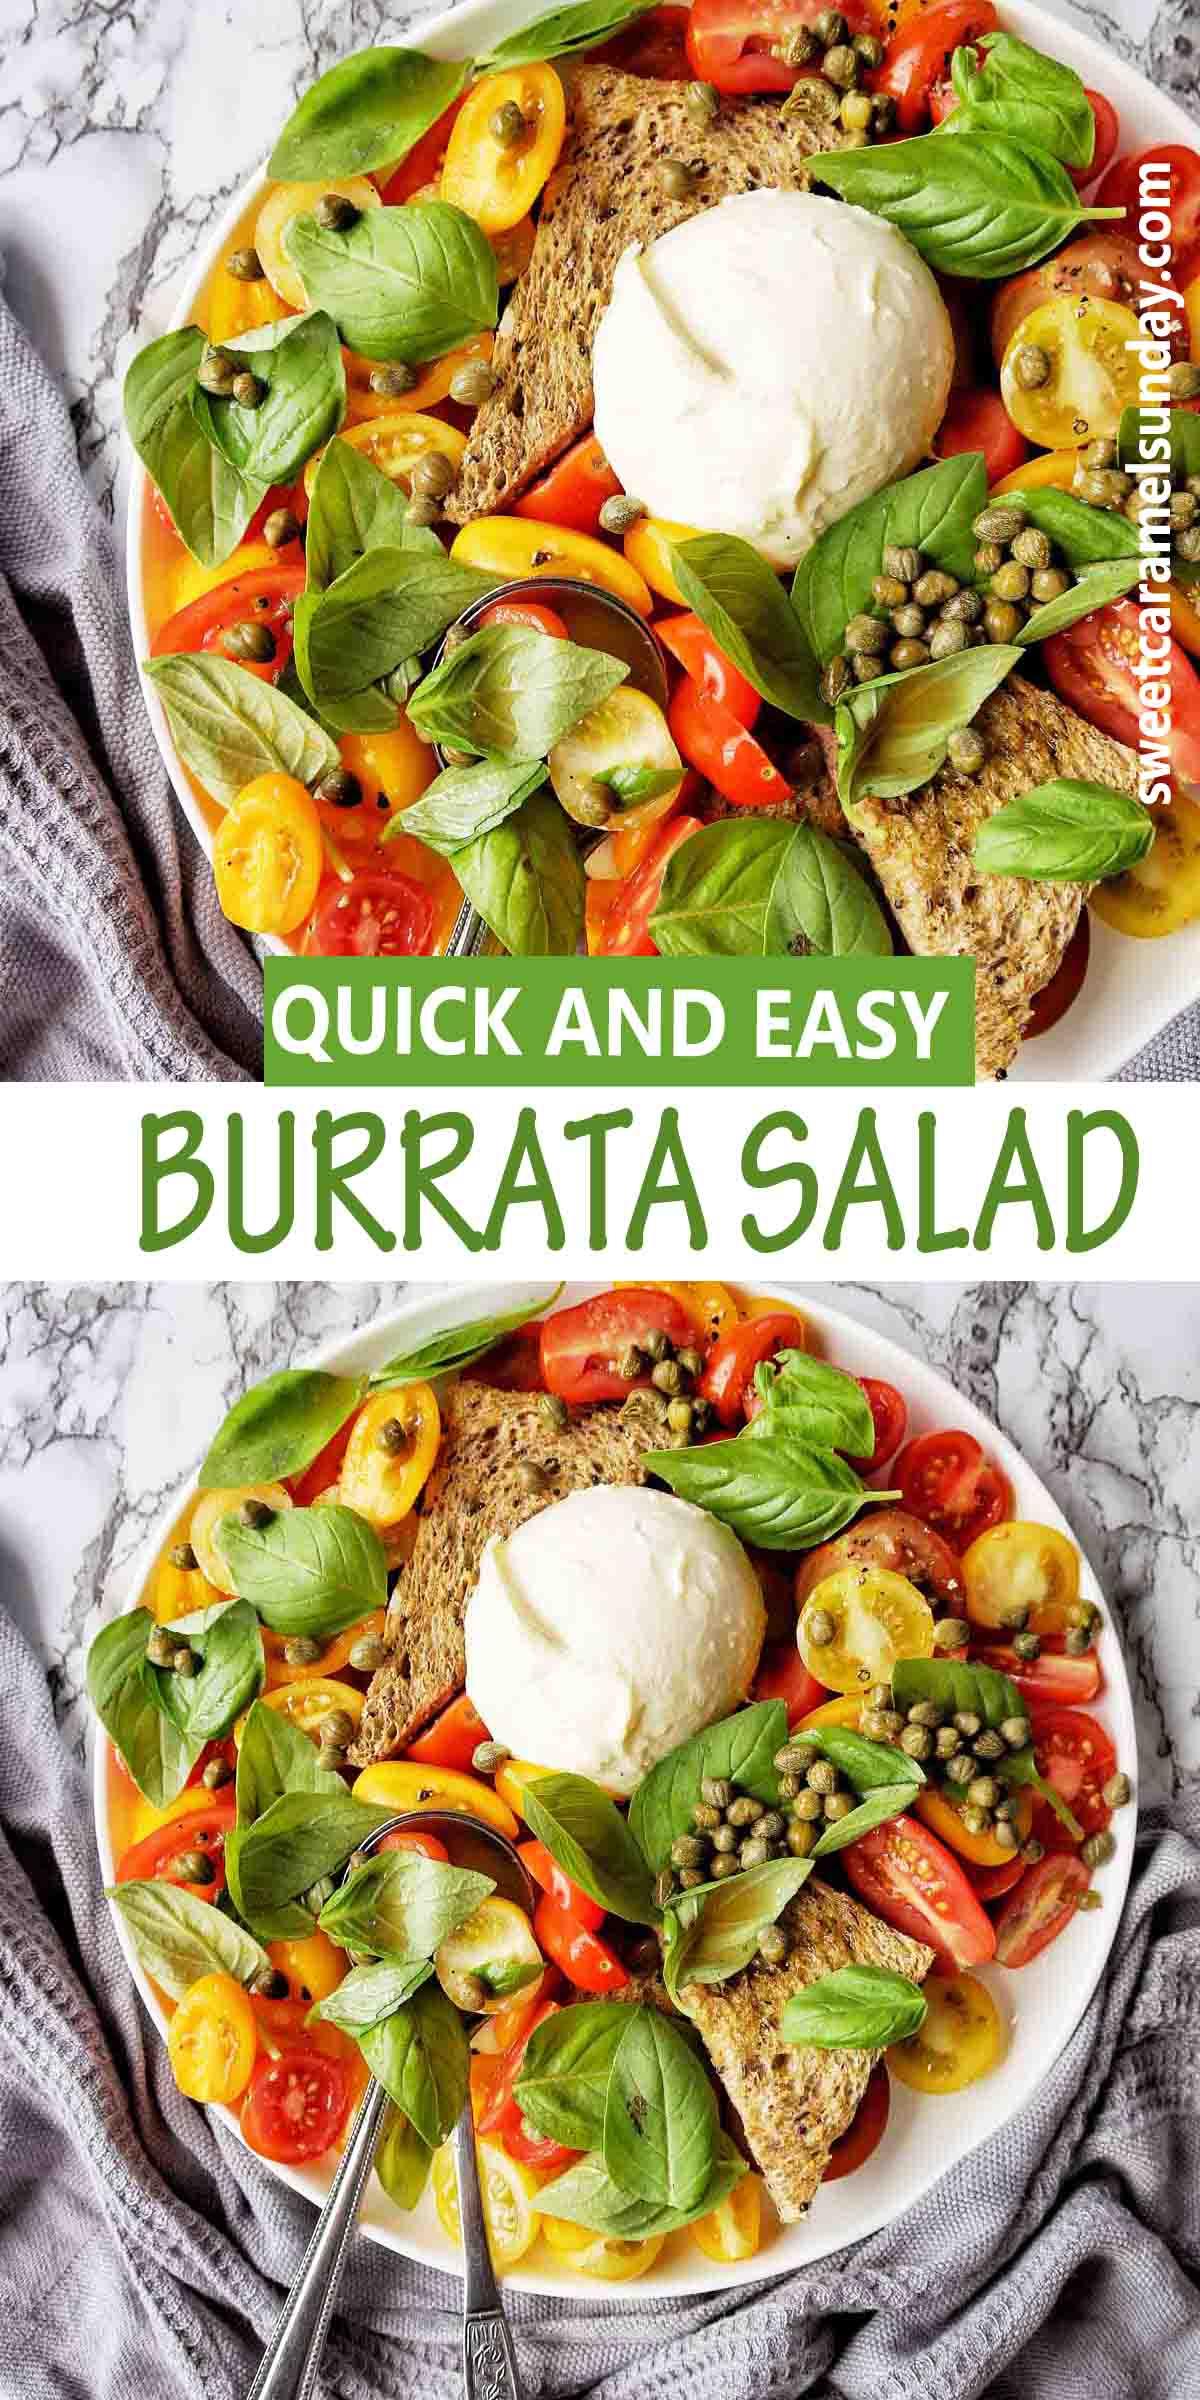 Burrata Salad with text overlay